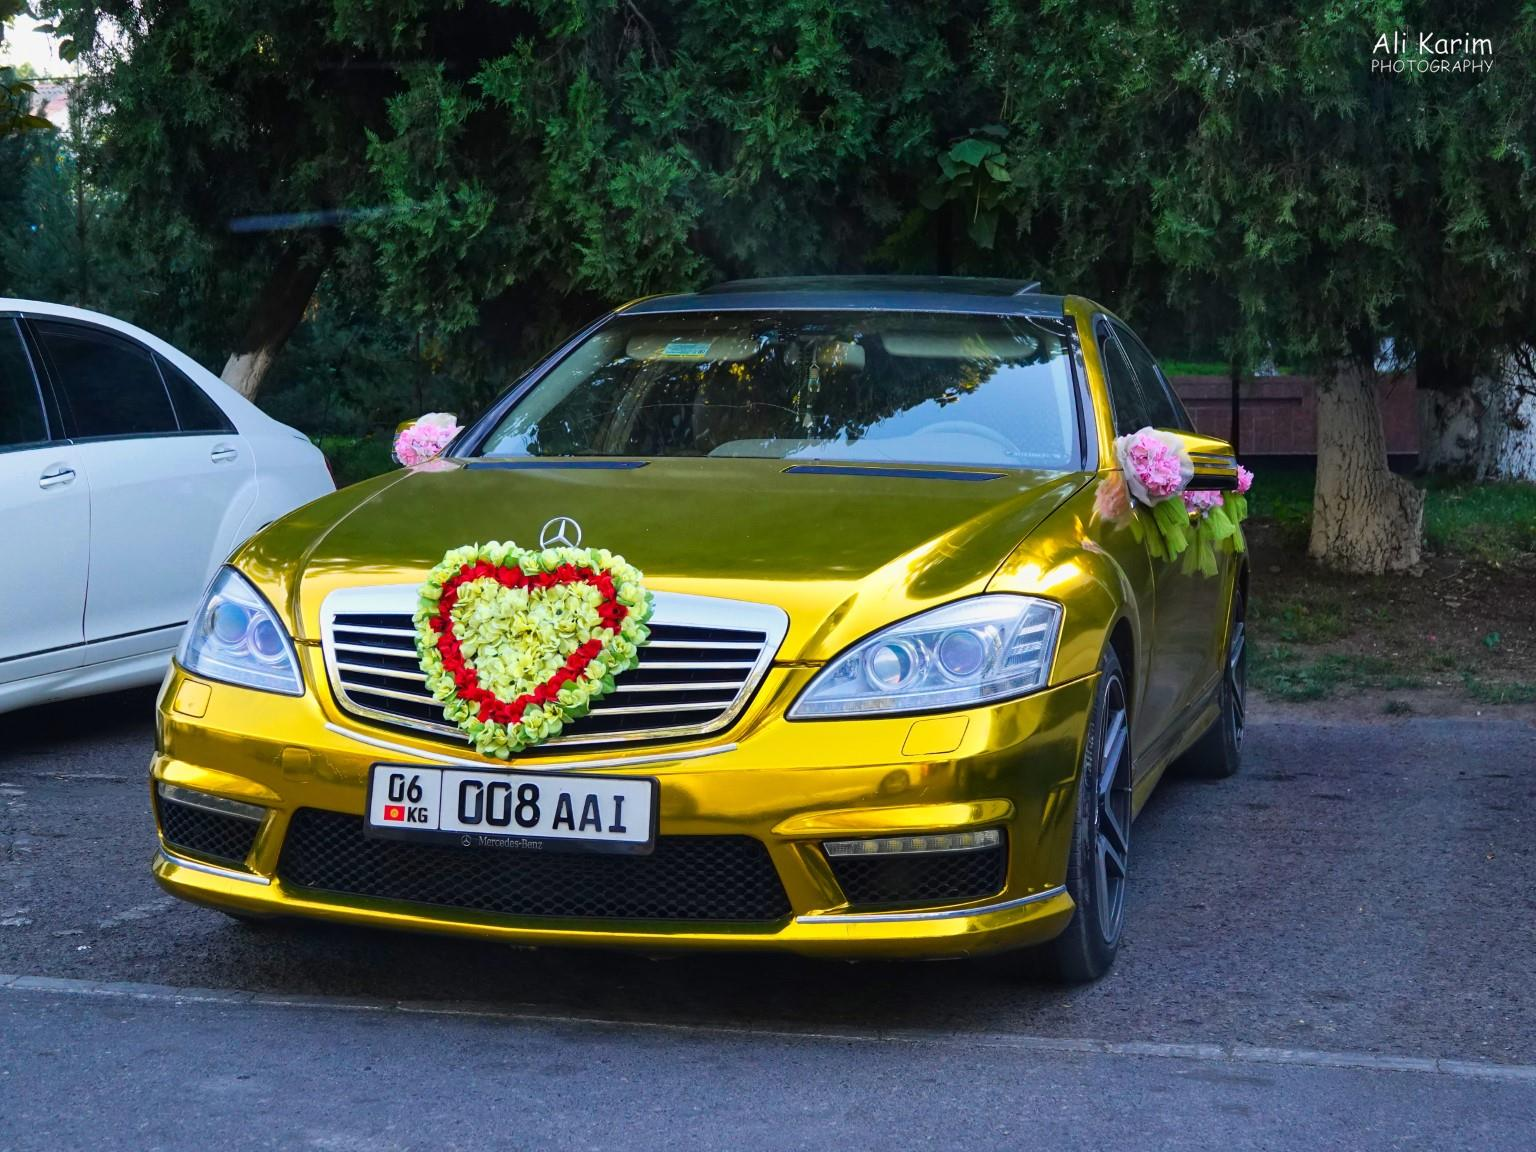 Silk Road 15: Osh, Kyrgyzstan Interesting Wedding cars, weddings seem to be big business here